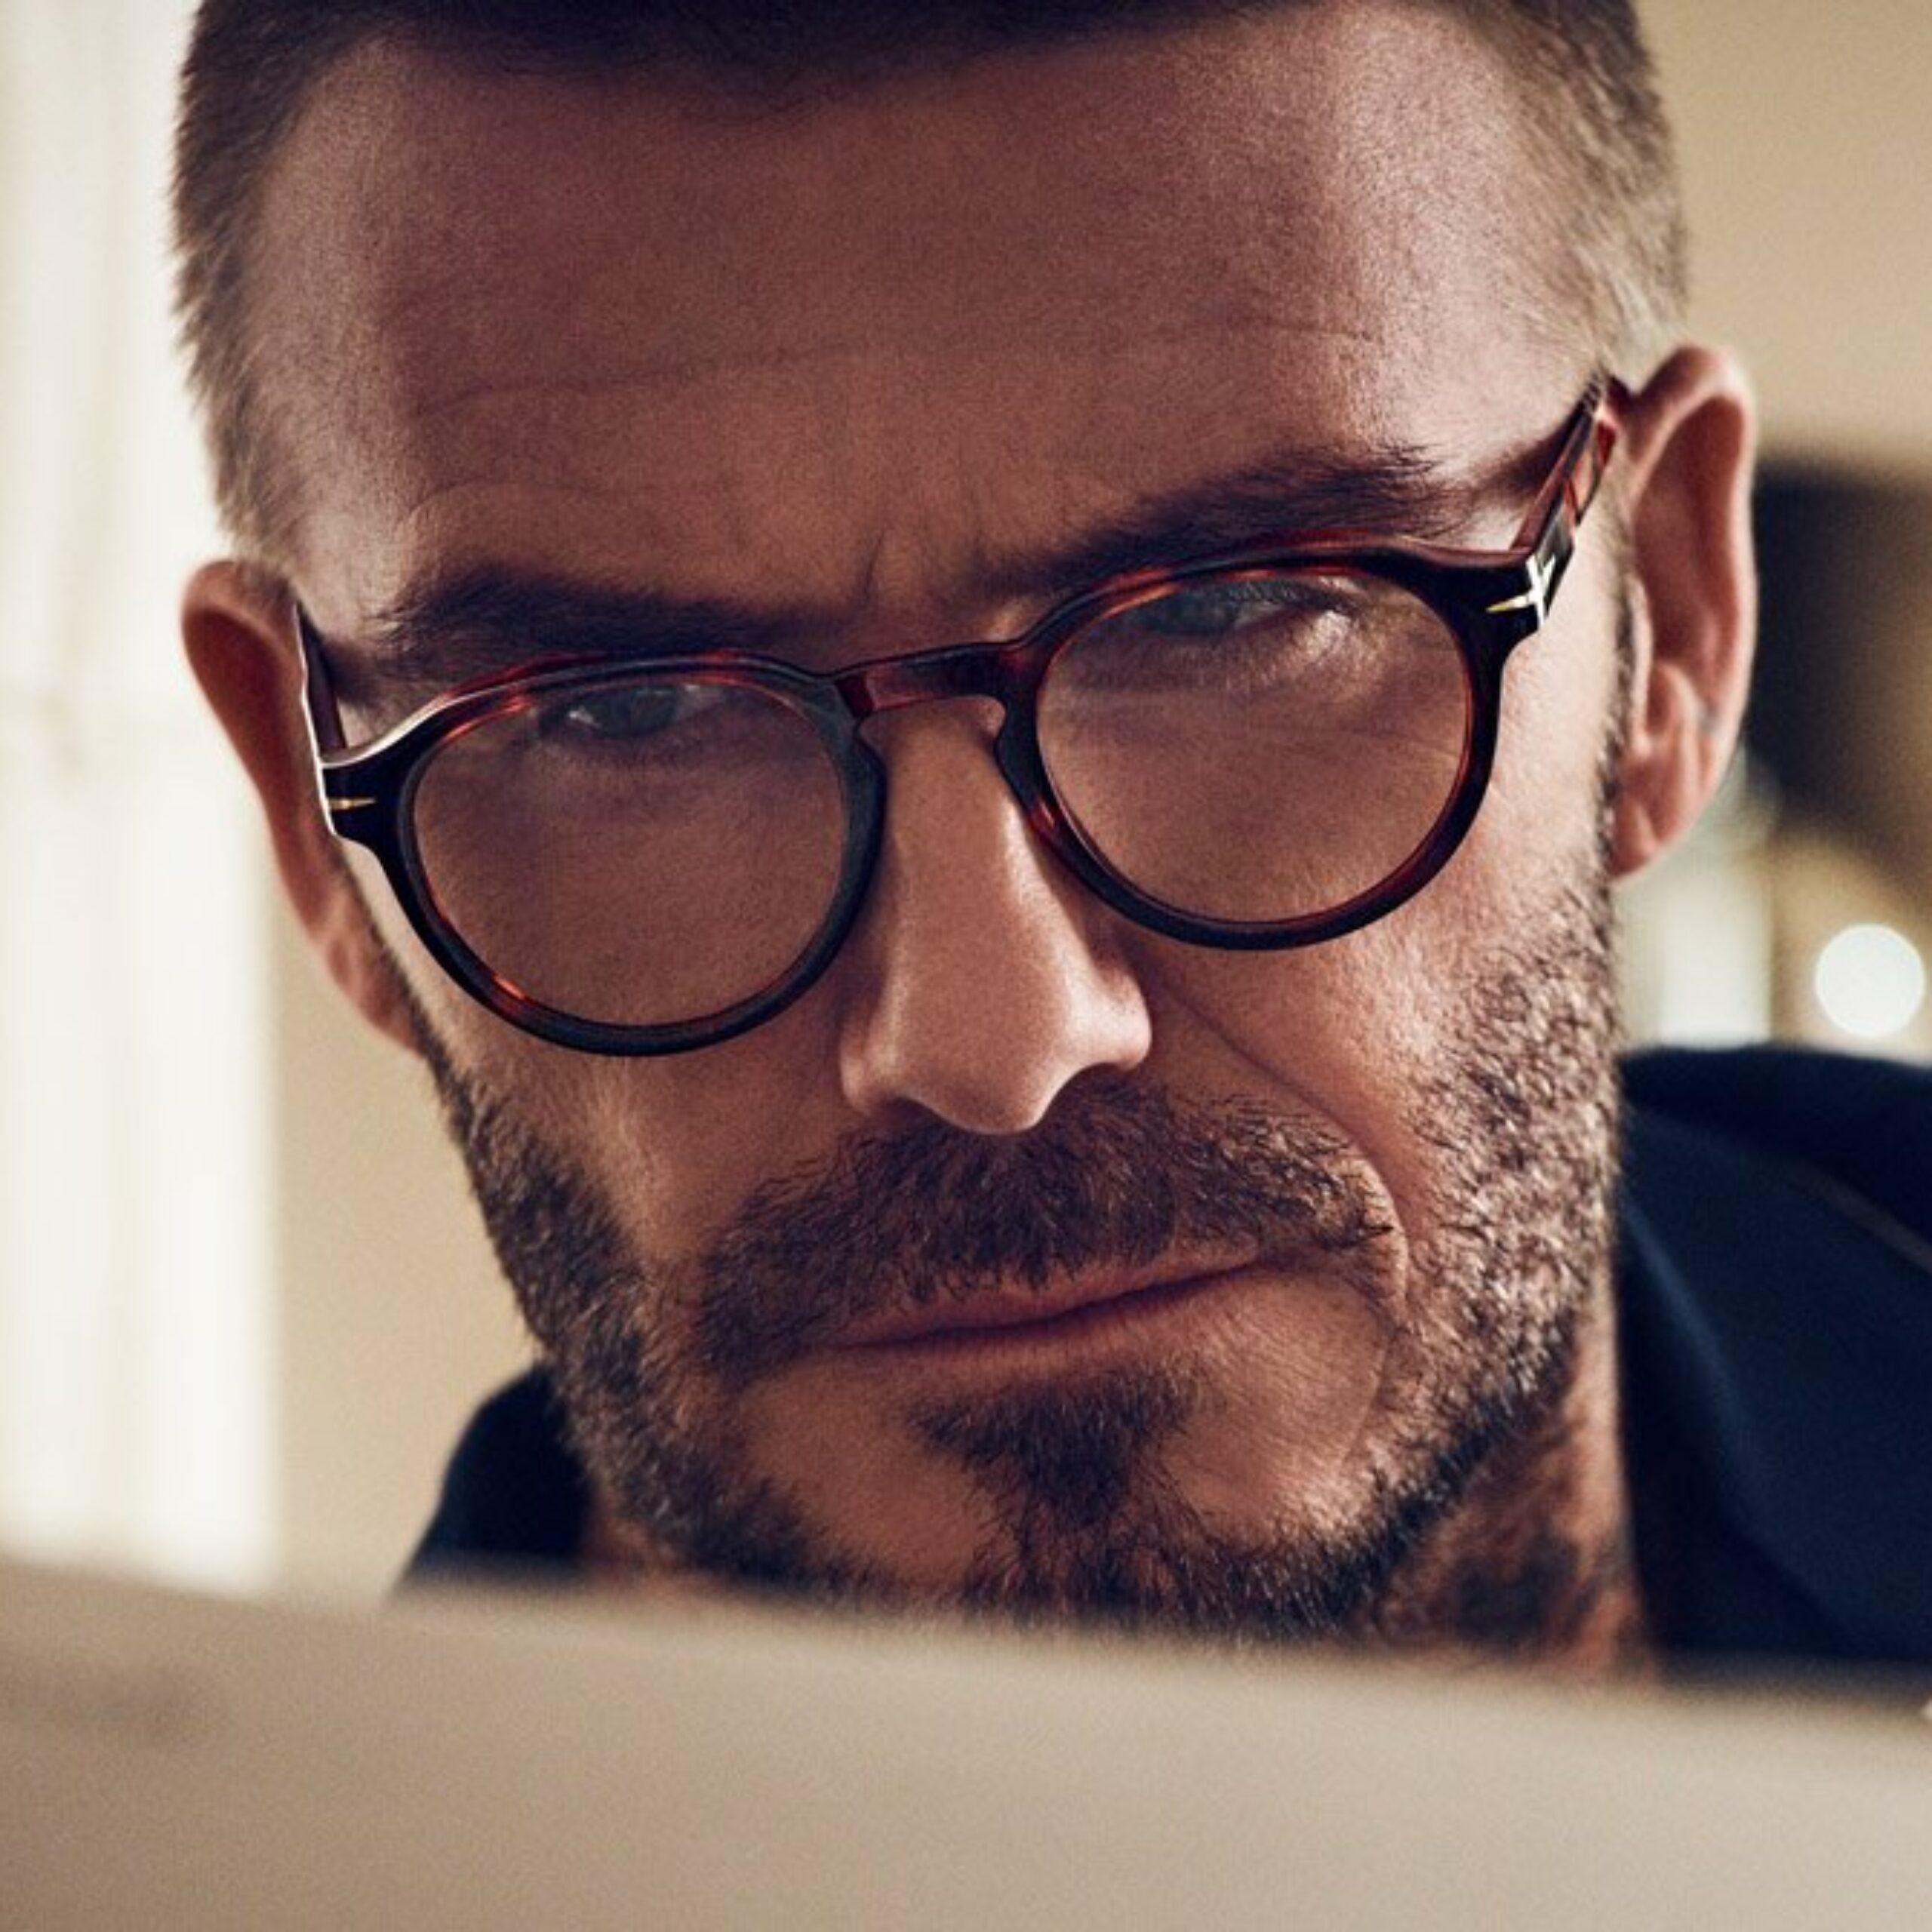 David Beckham eyewear - Frames and Faces